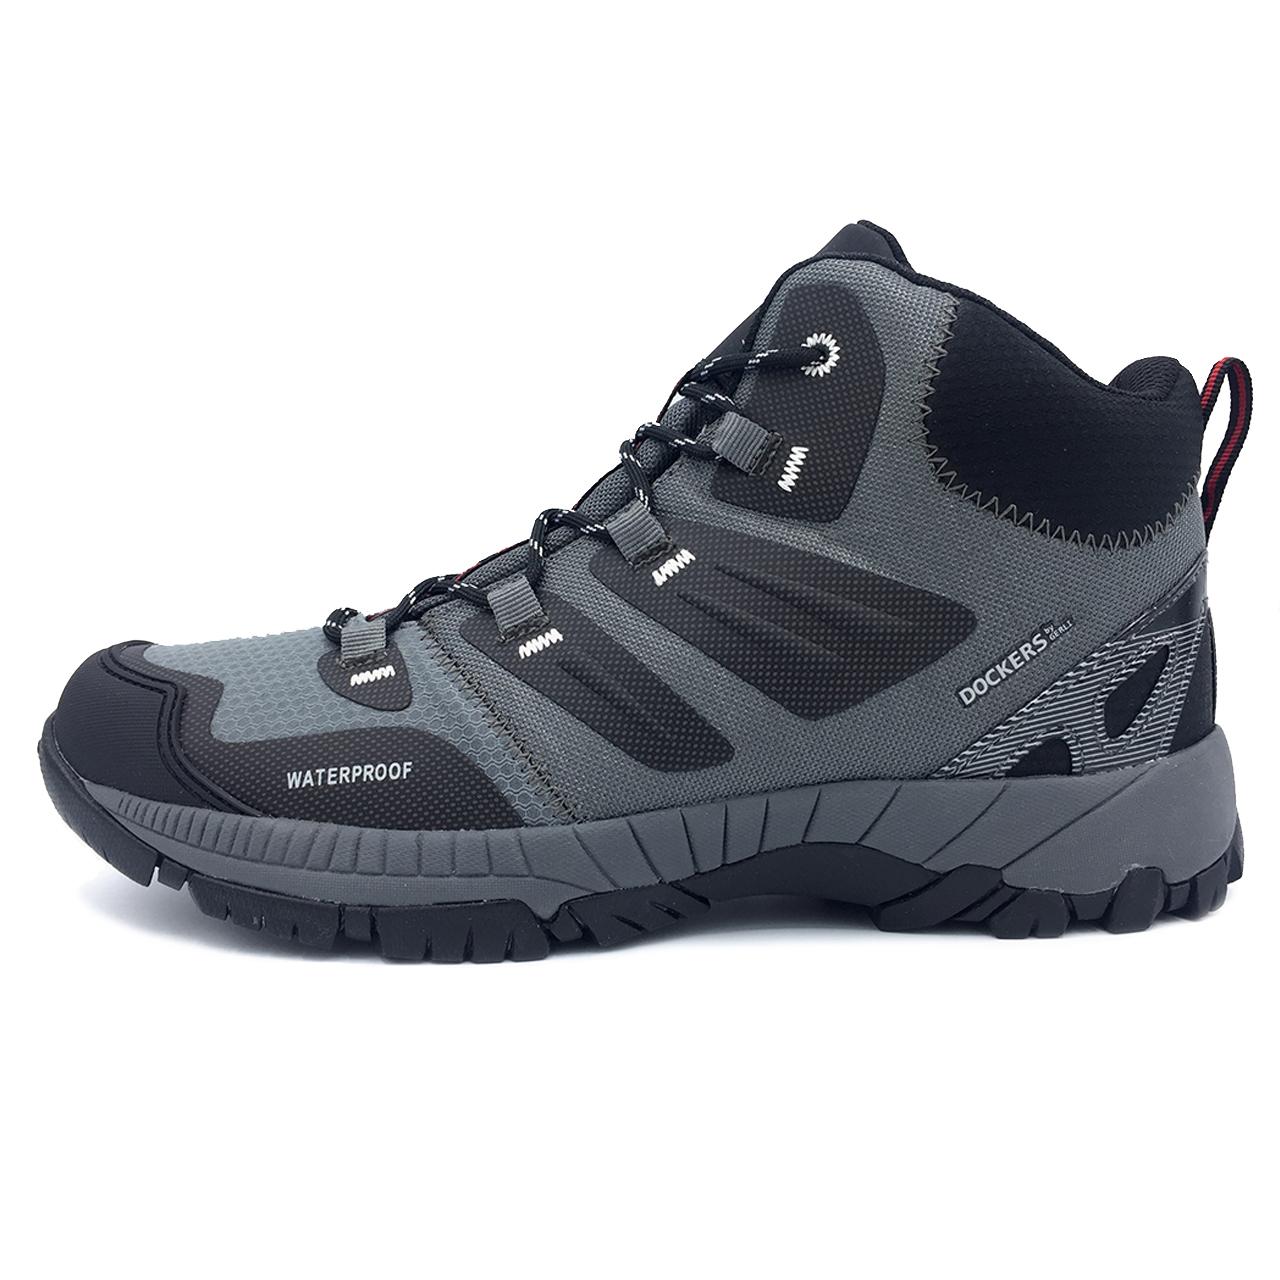 قیمت کفش کوهنوردی مردانه داکرز مدل JH-HI43096-TO